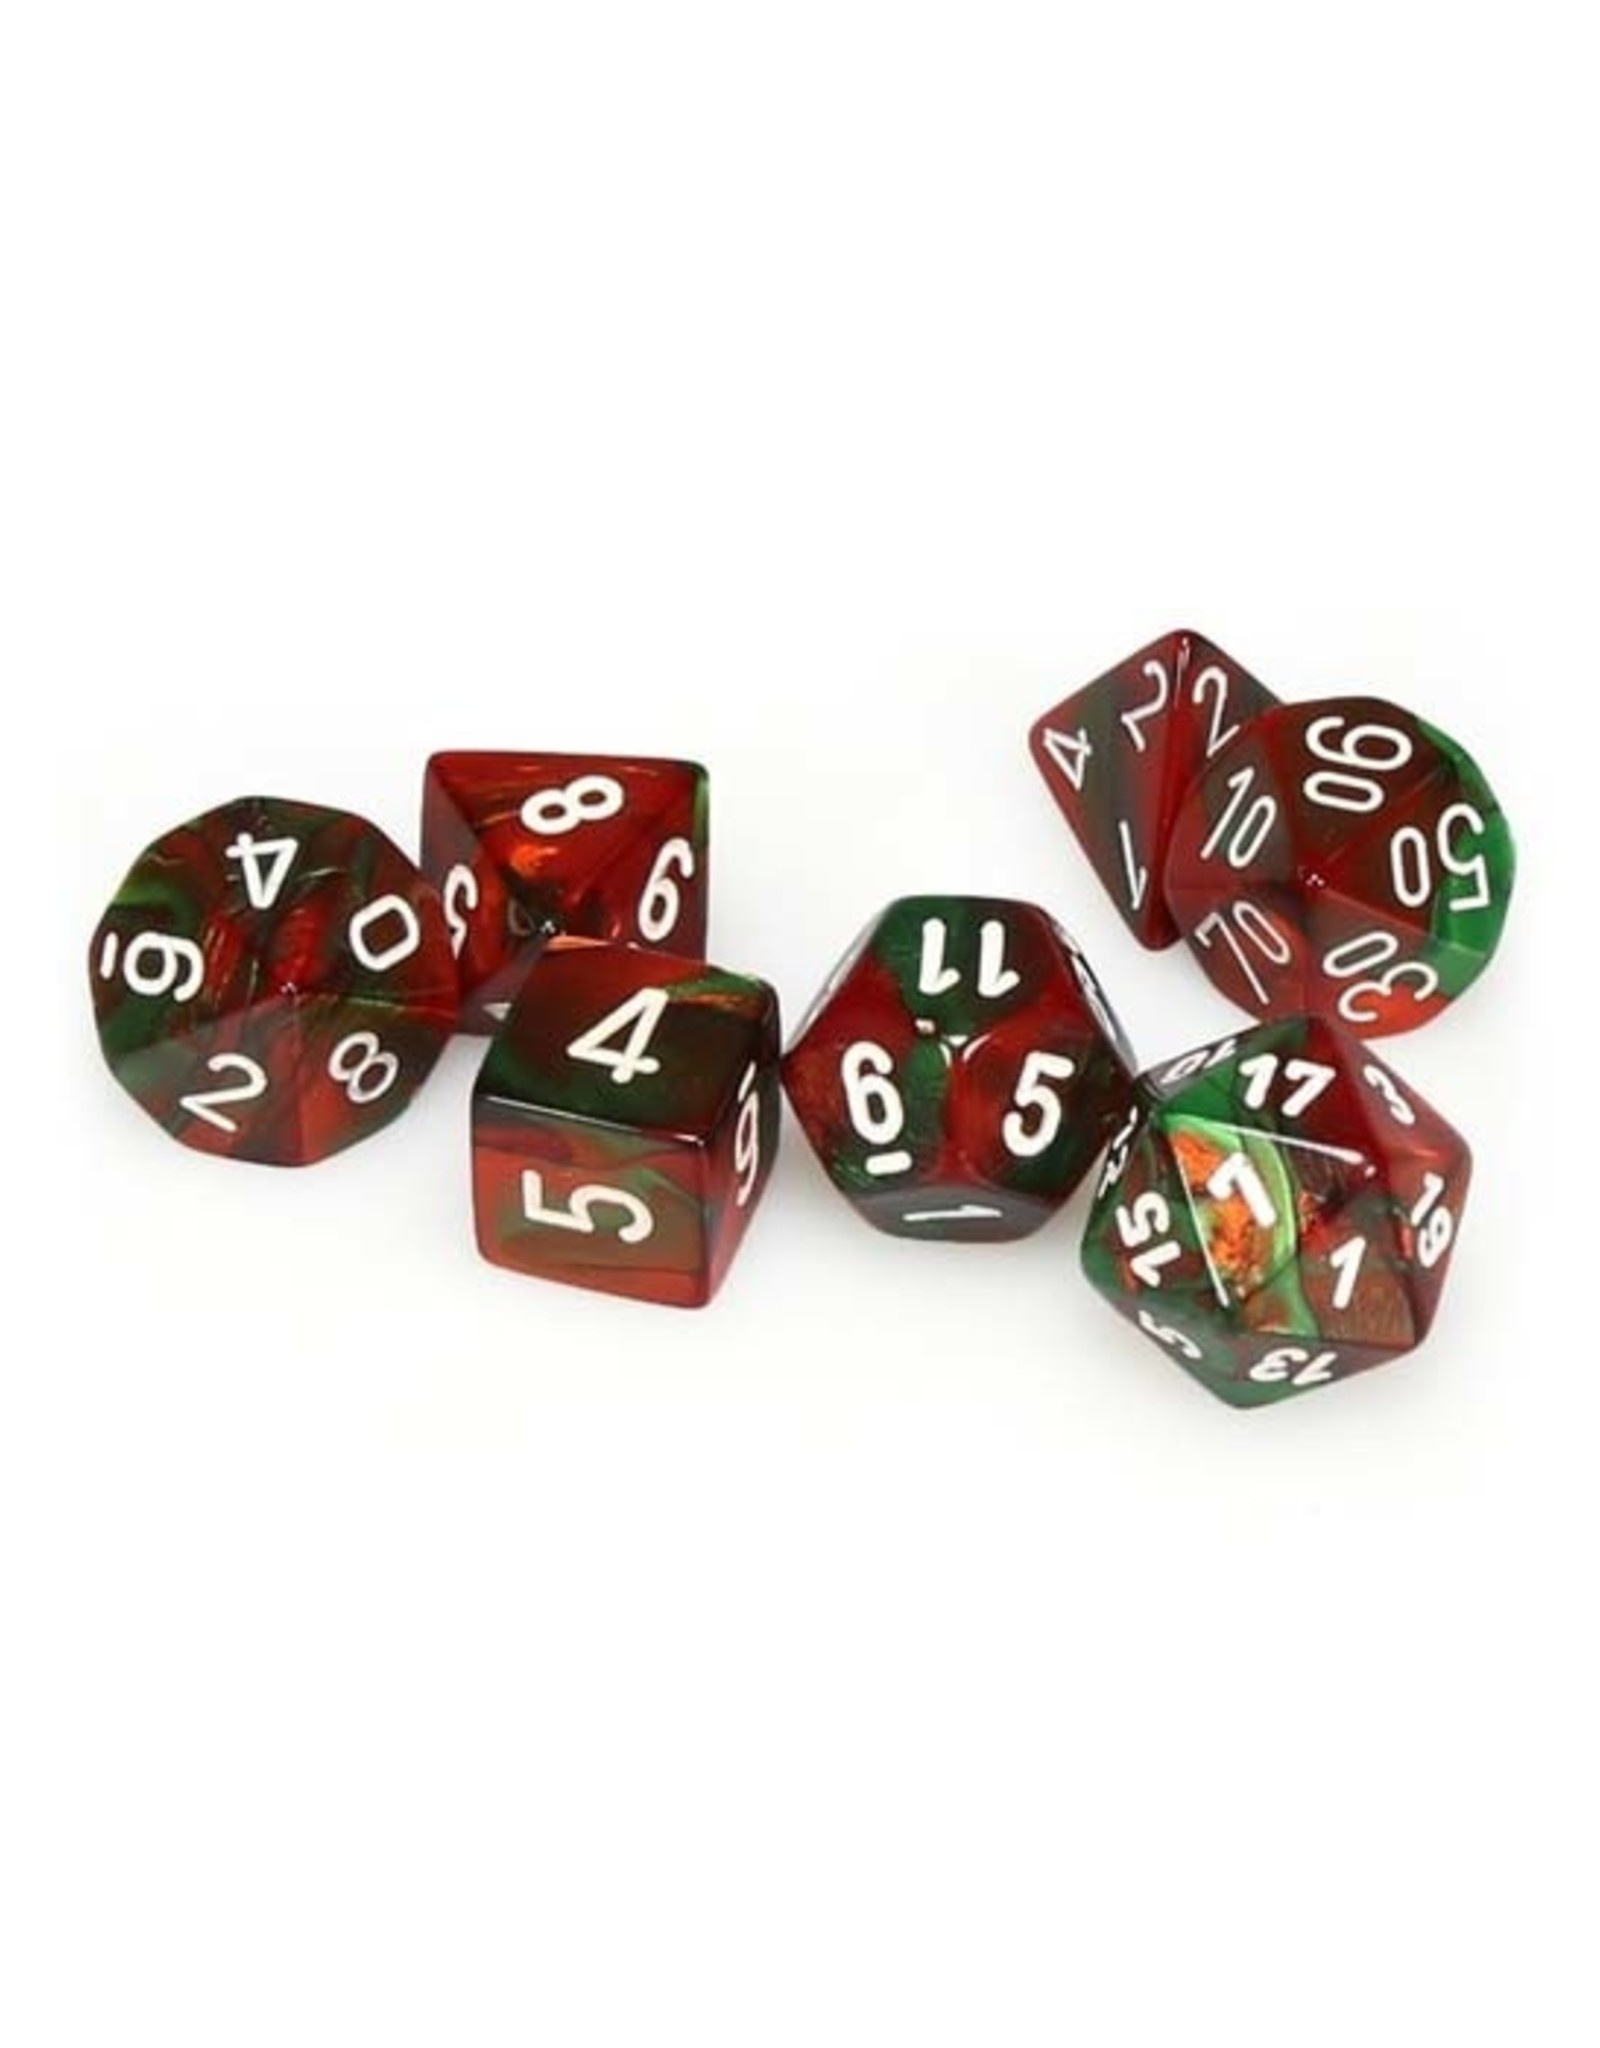 Chessex Chessex: Poly 7 Set - Gemini - Green-Red w/ White